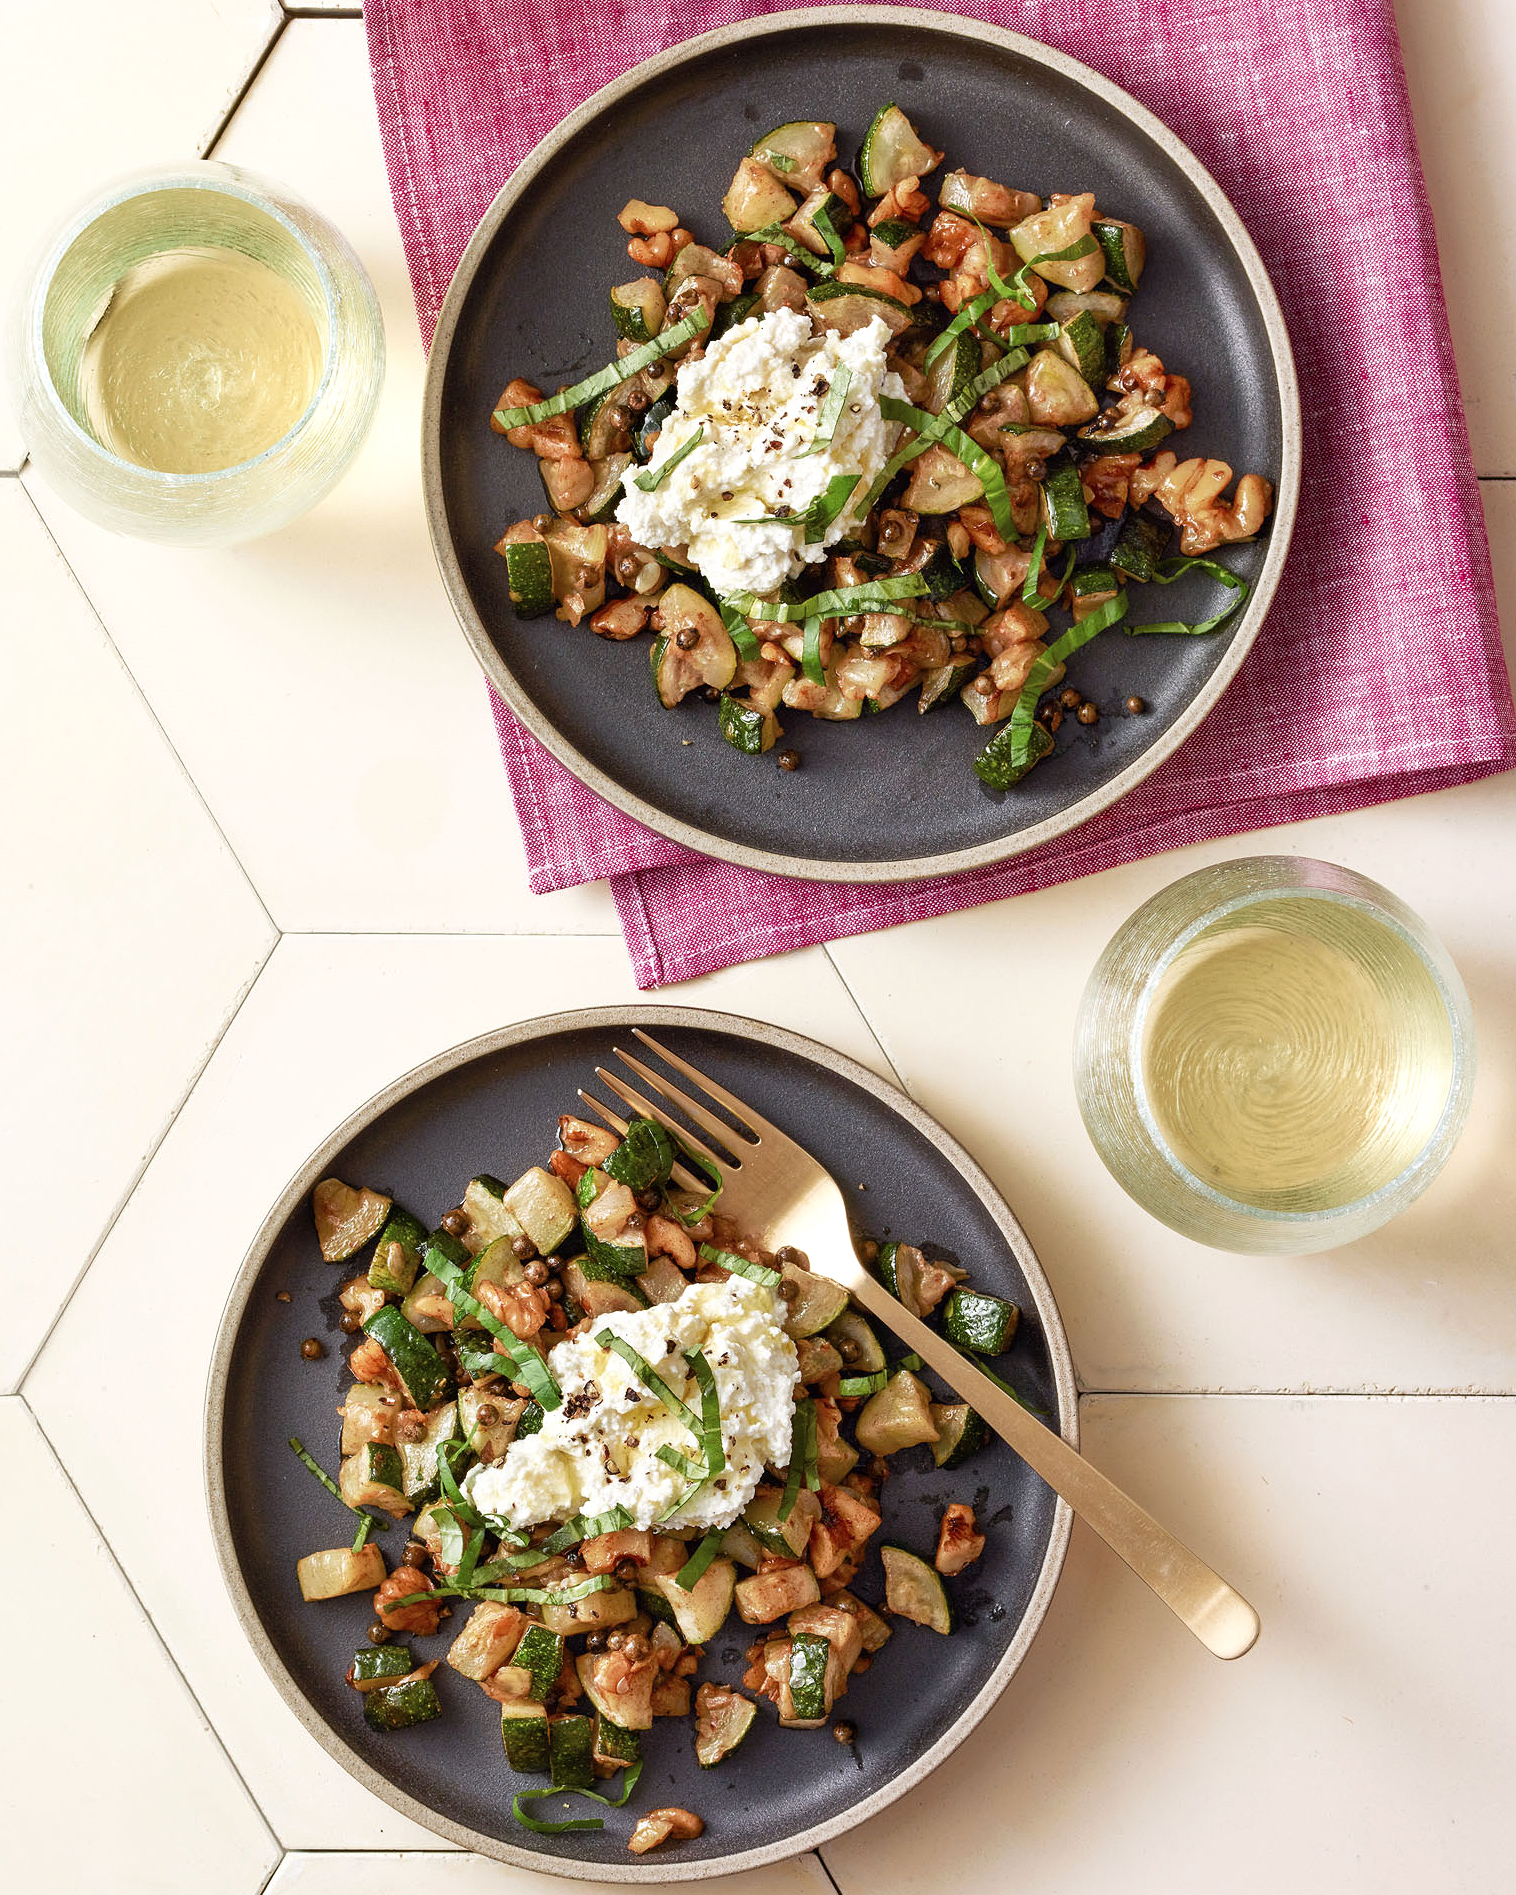 Pan-Seared Zucchini with Green Peppercorns & Ricotta